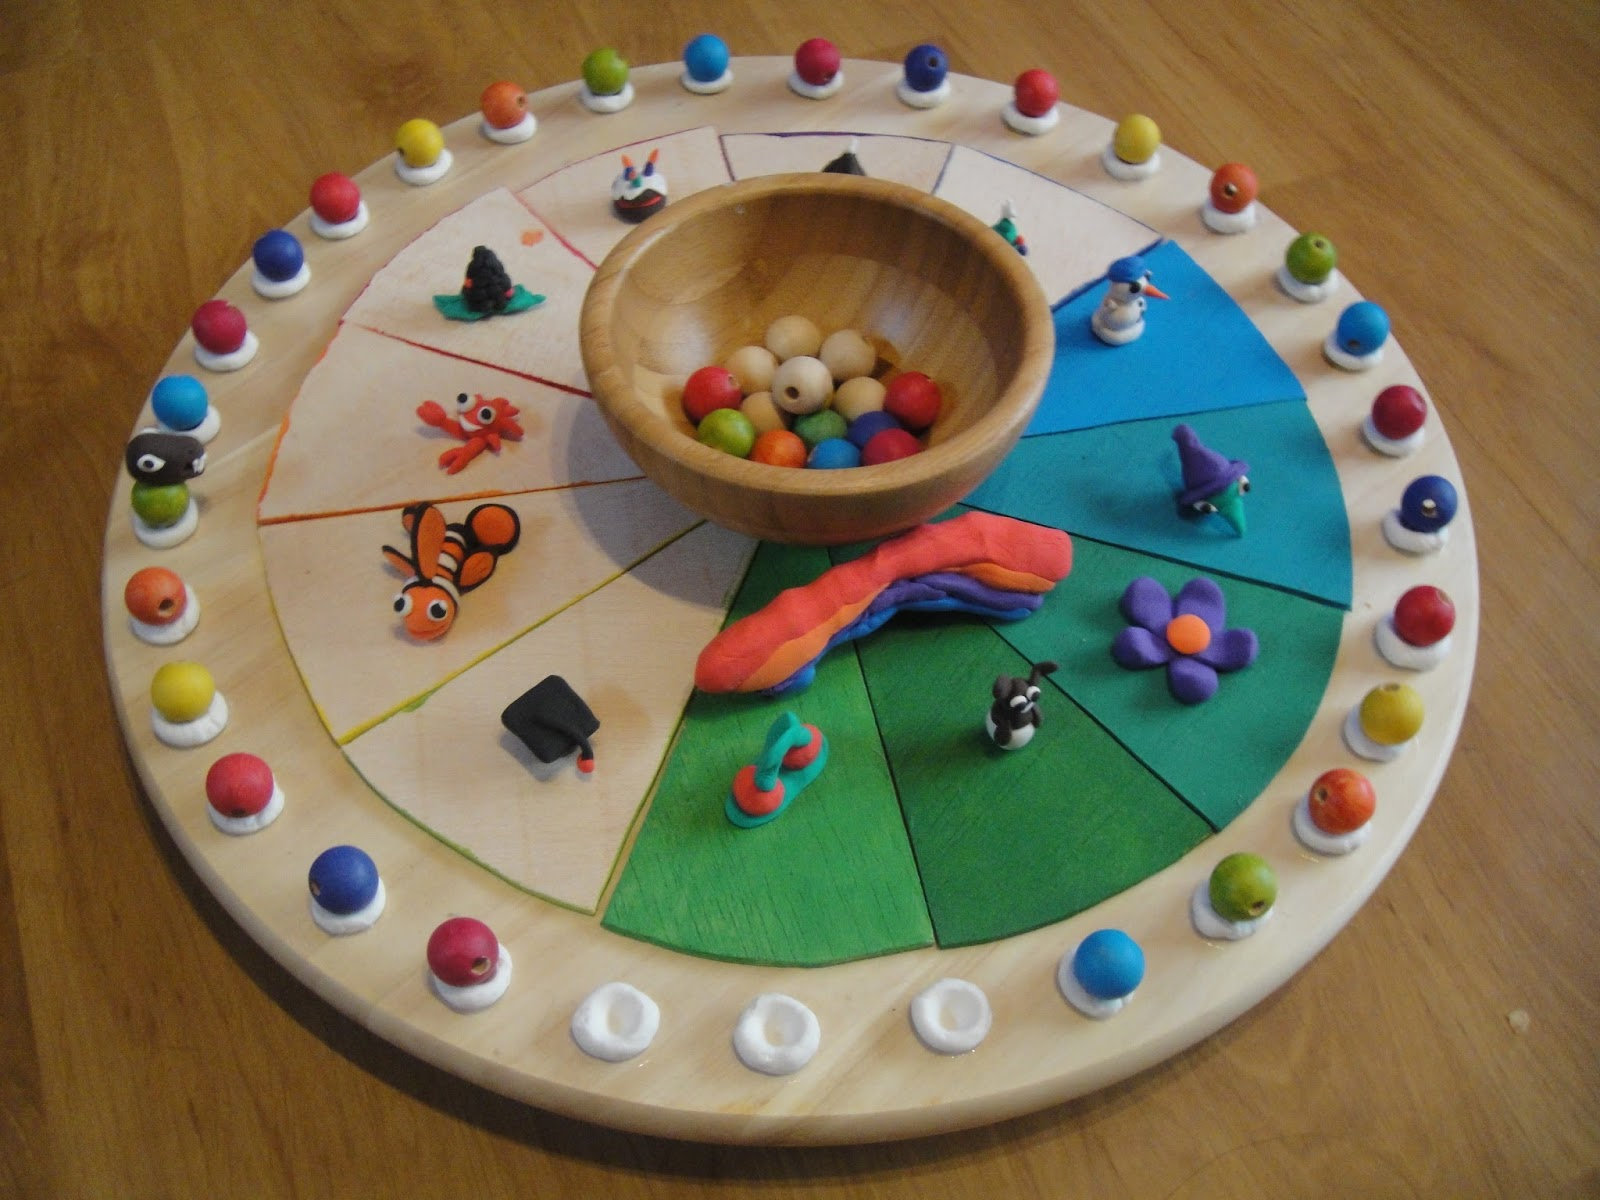 Calendario Montessori.Hablame Bajito Diy Nuestro Calendario Waldorfssori Waldorf